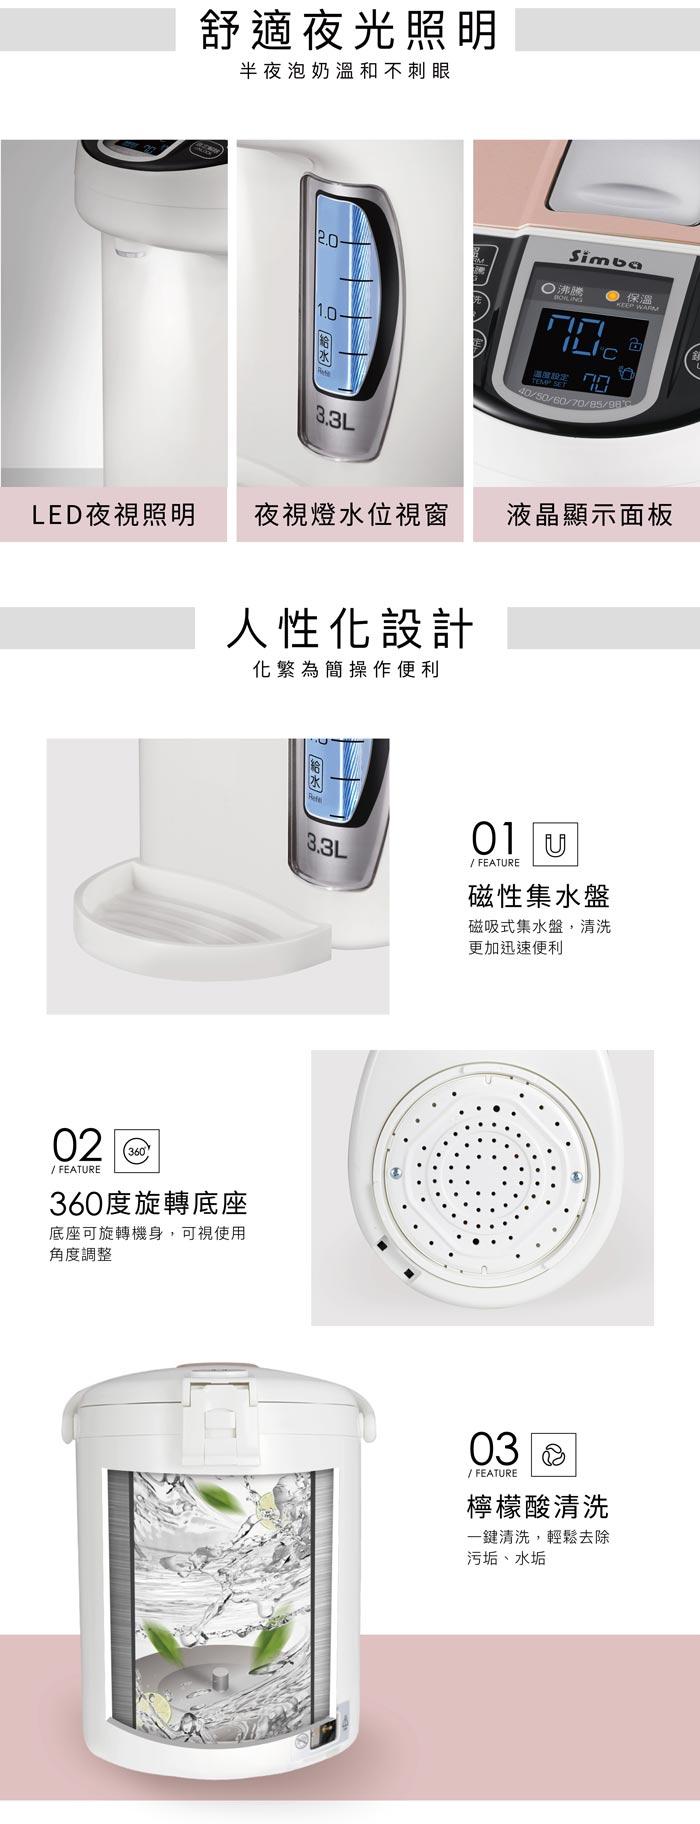 【Simba小獅王辛巴】智能六段式定溫調乳器S5 PRO 5